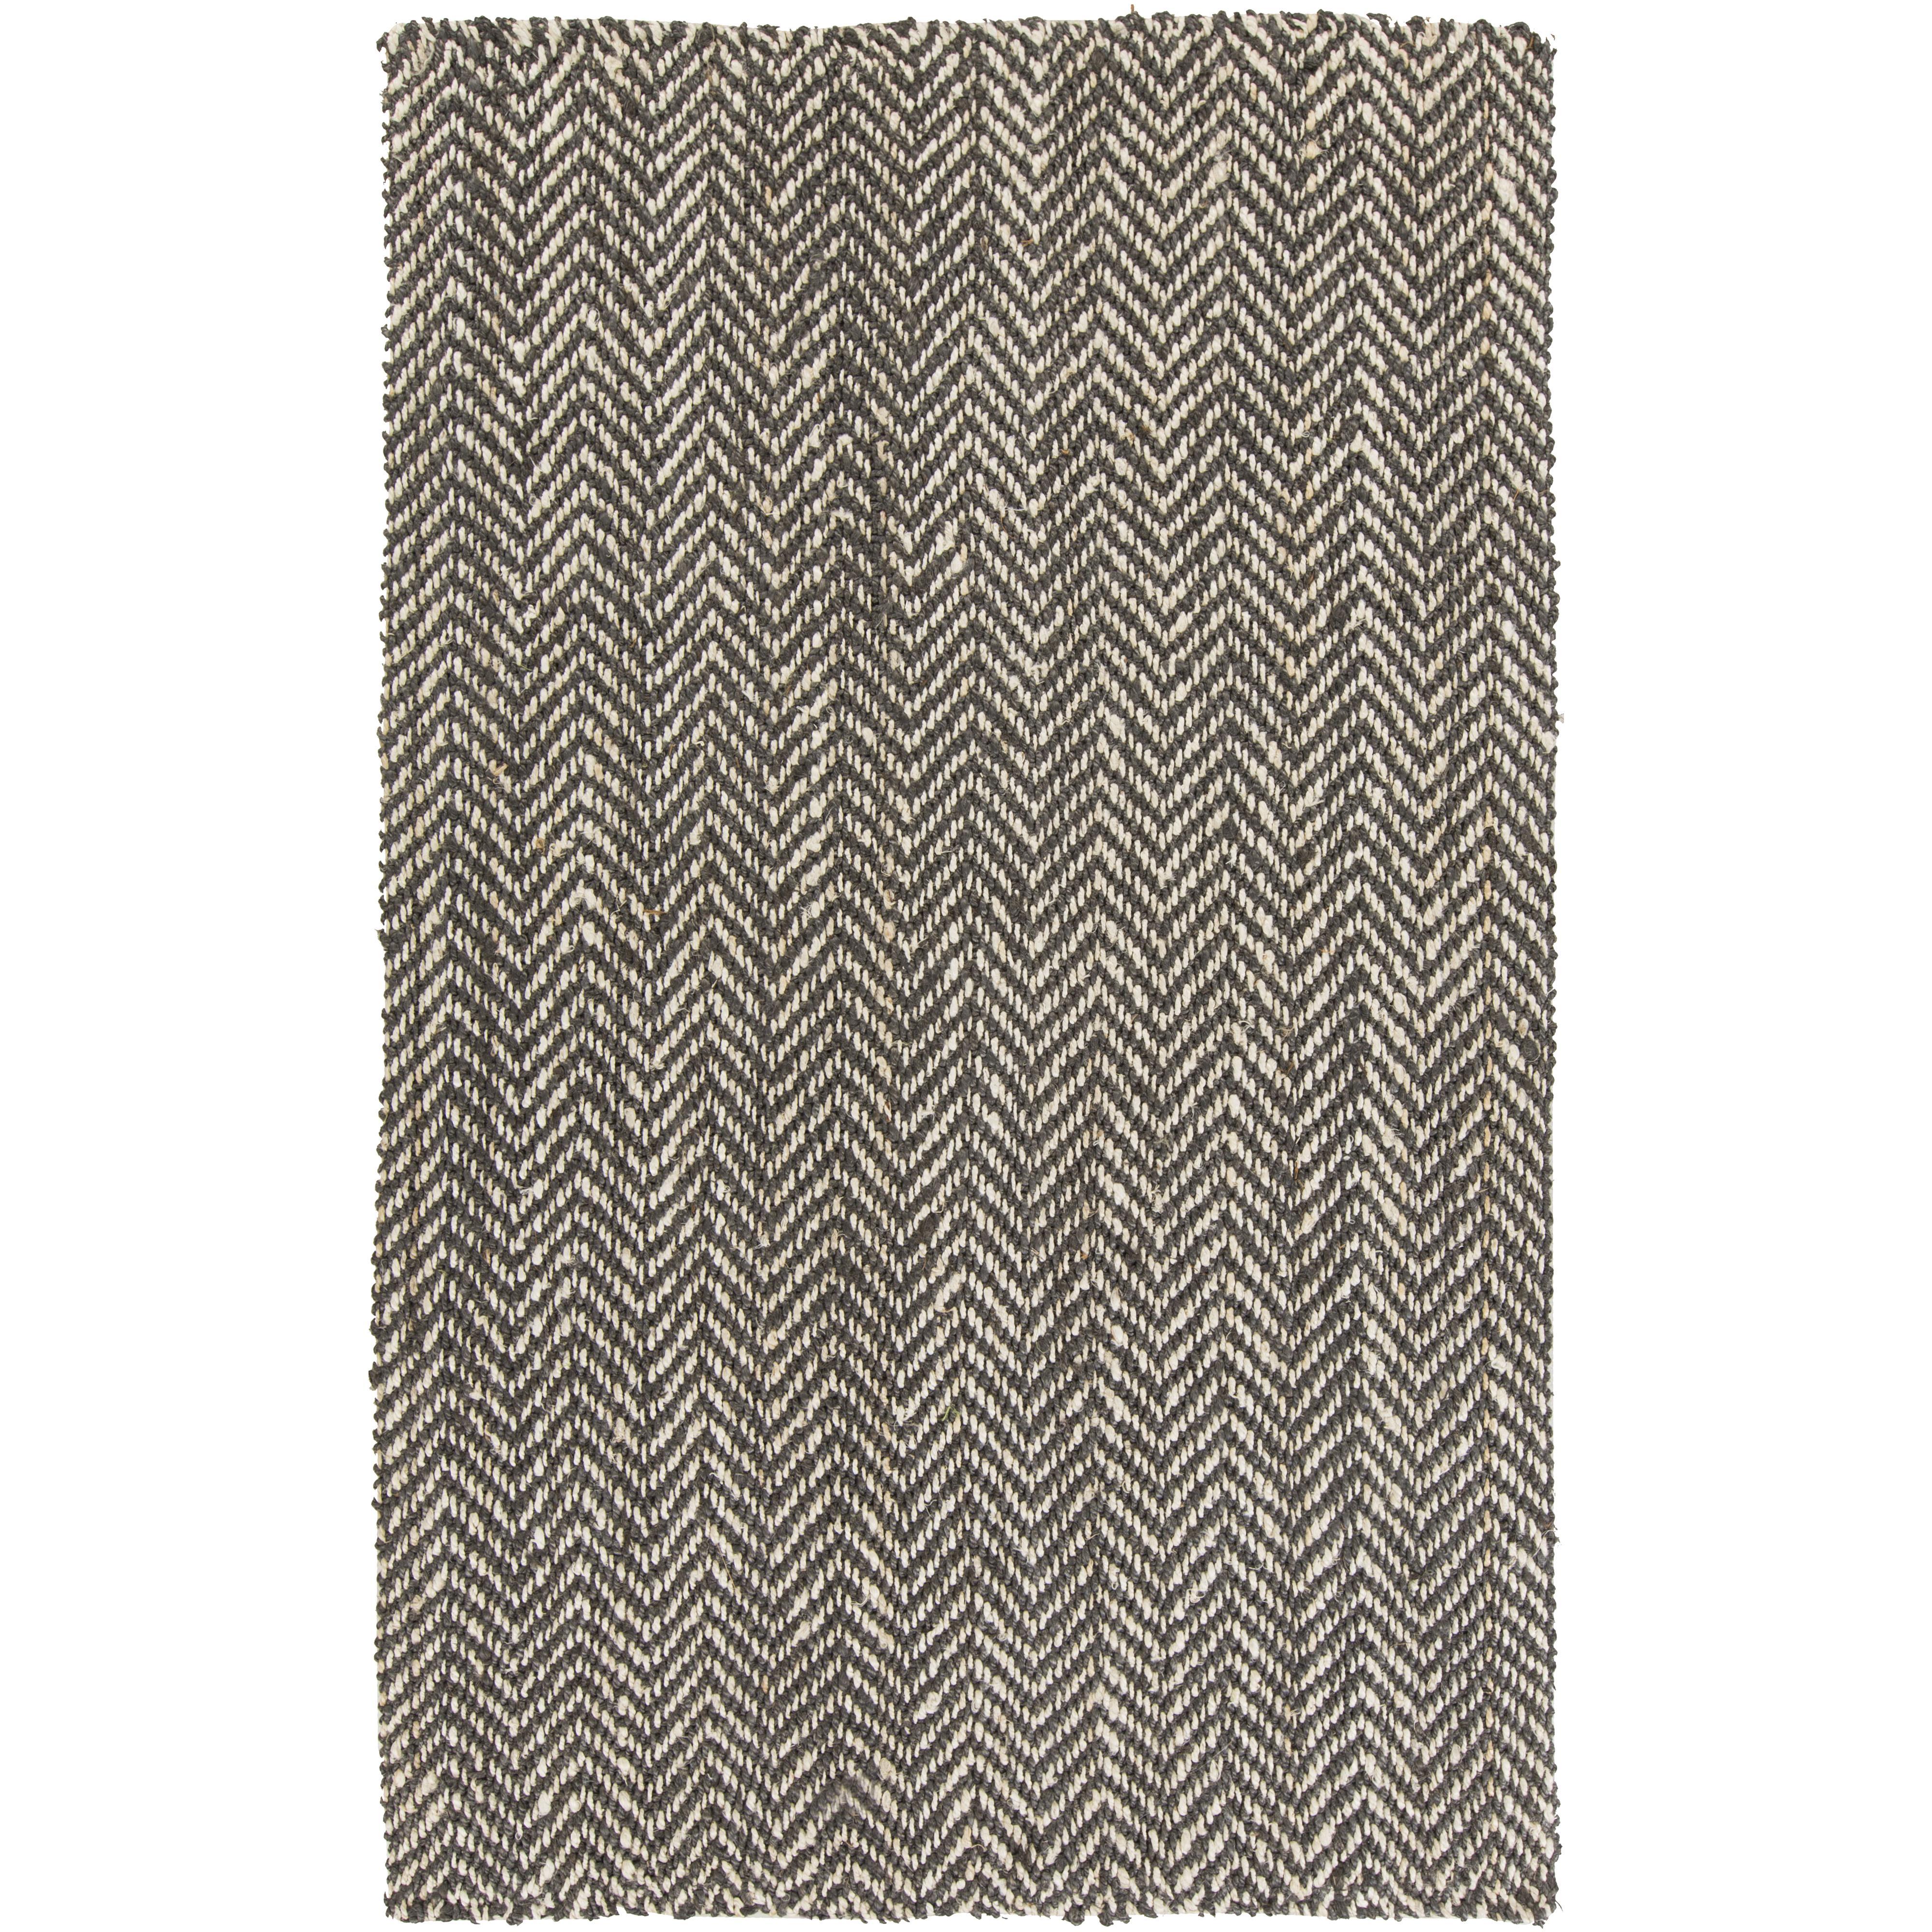 Surya Reeds 10' x 14' - Item Number: REED803-1014